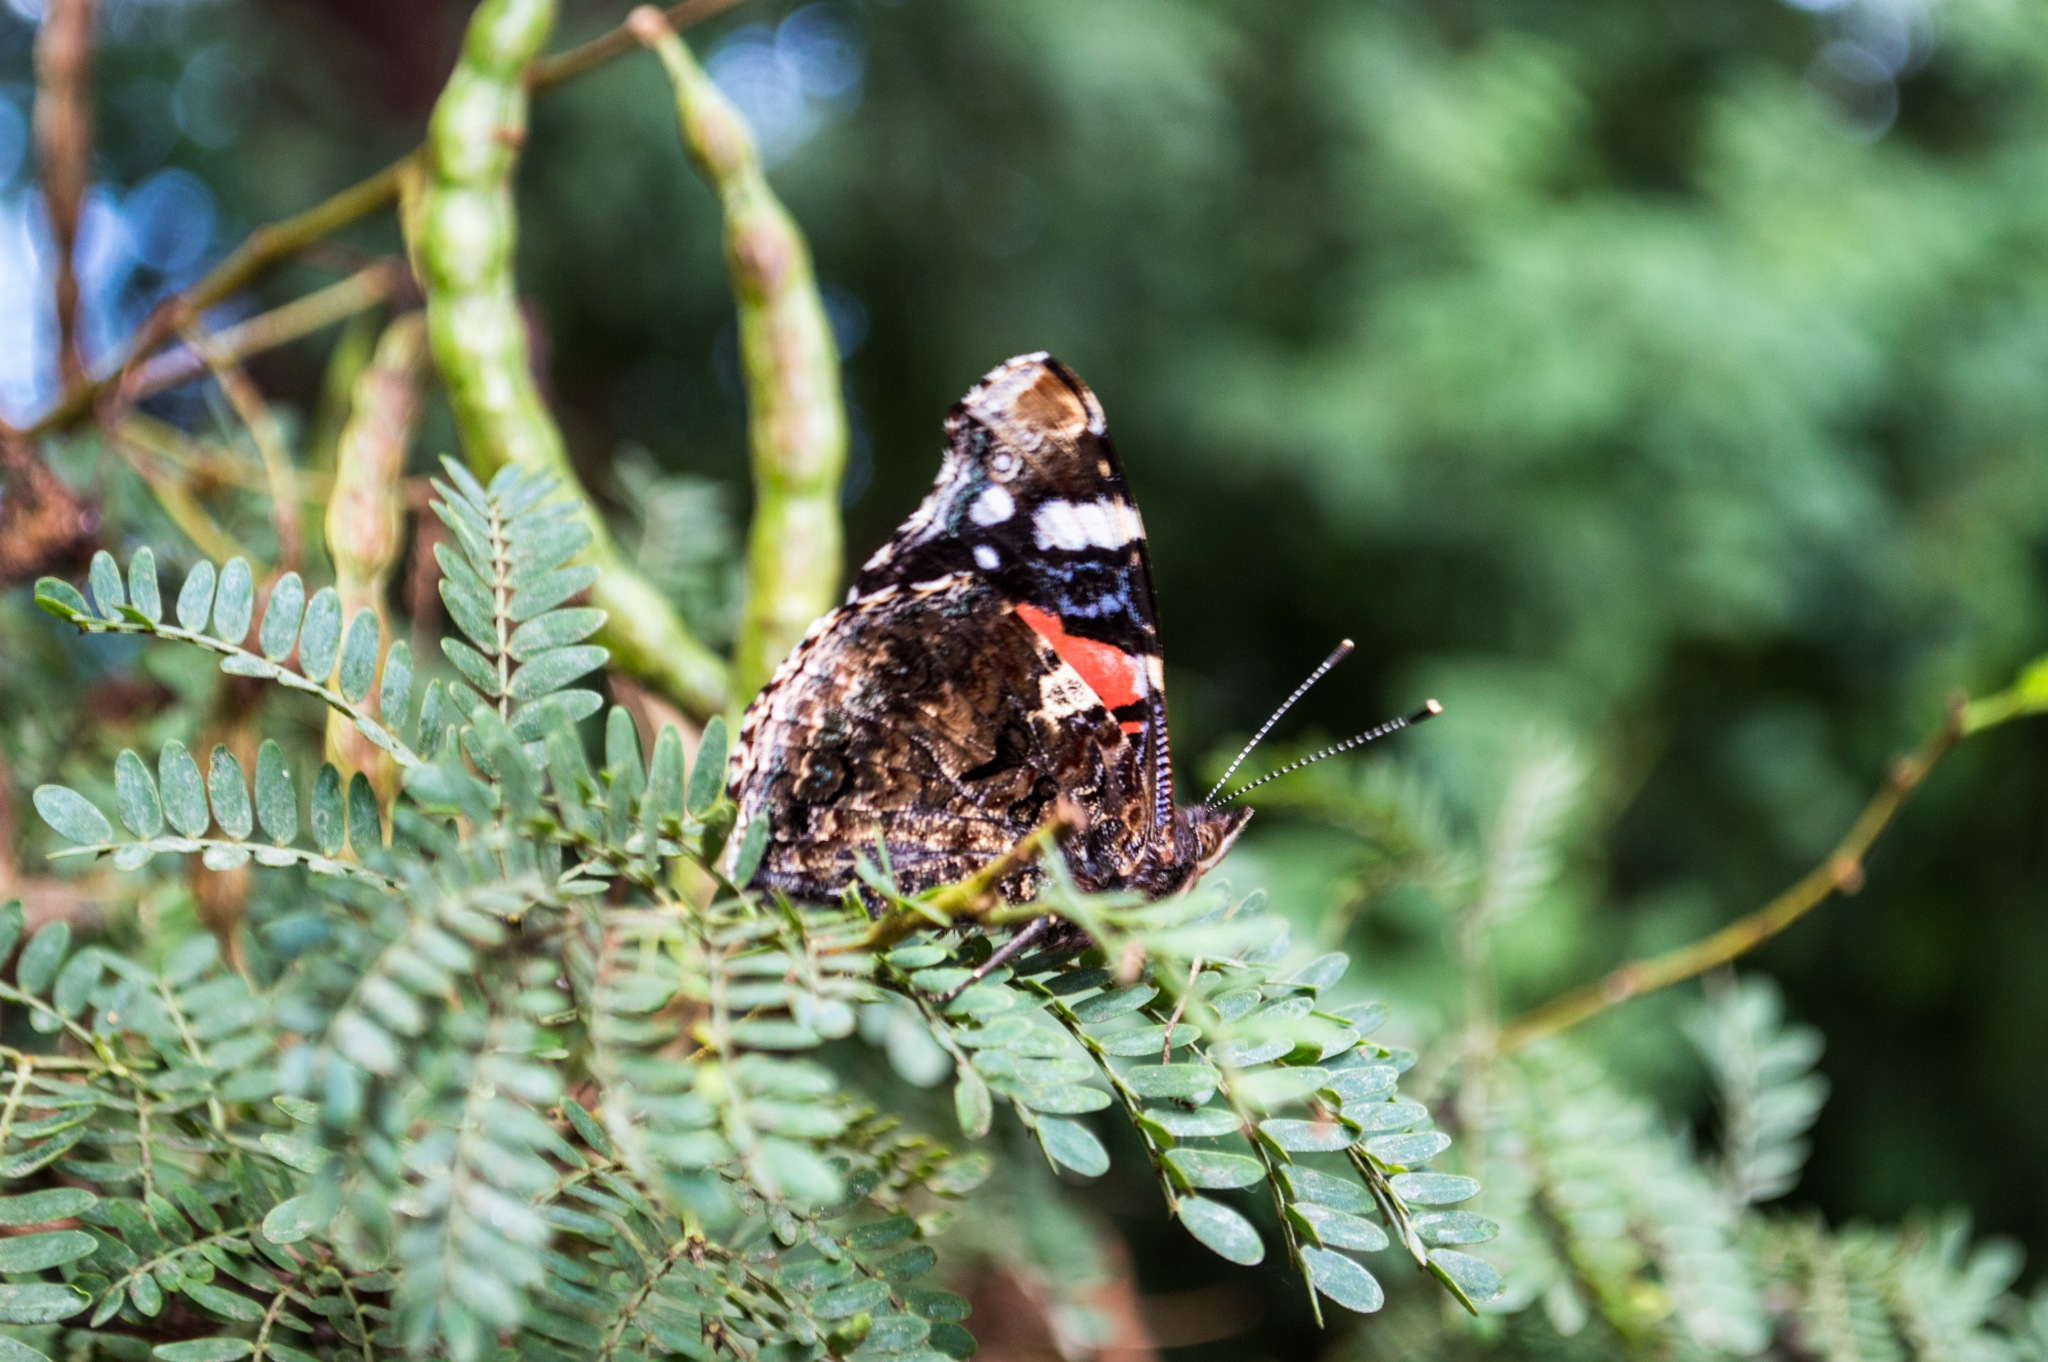 Moth by nedjma badri